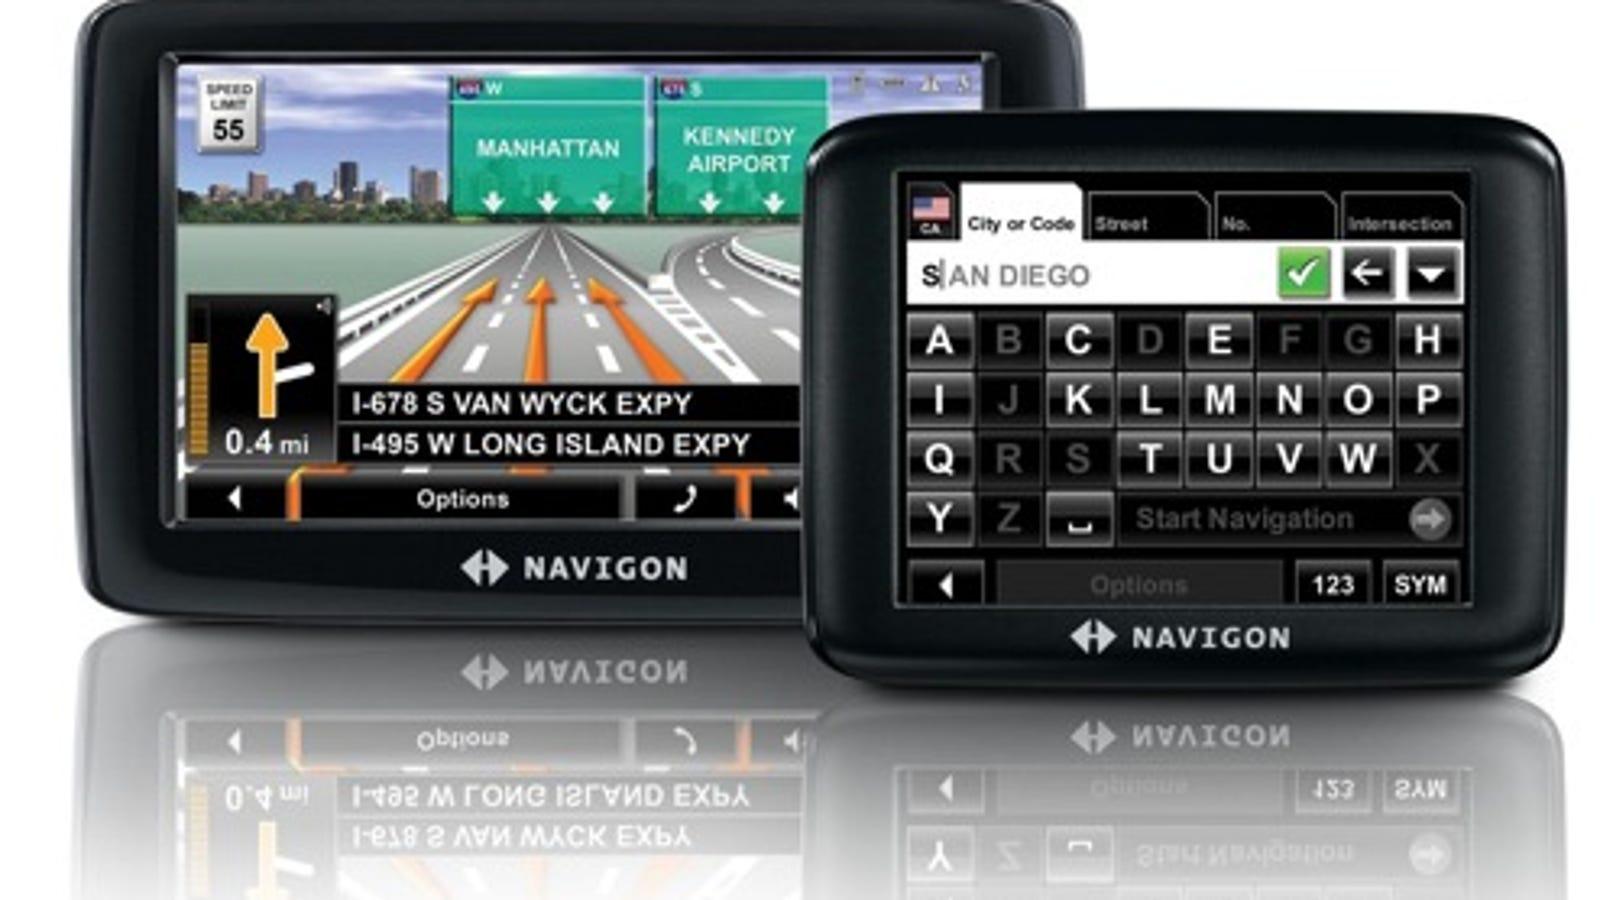 Navigon's New 5100 Max, 2090S GPS Units Get 2 Years of Free